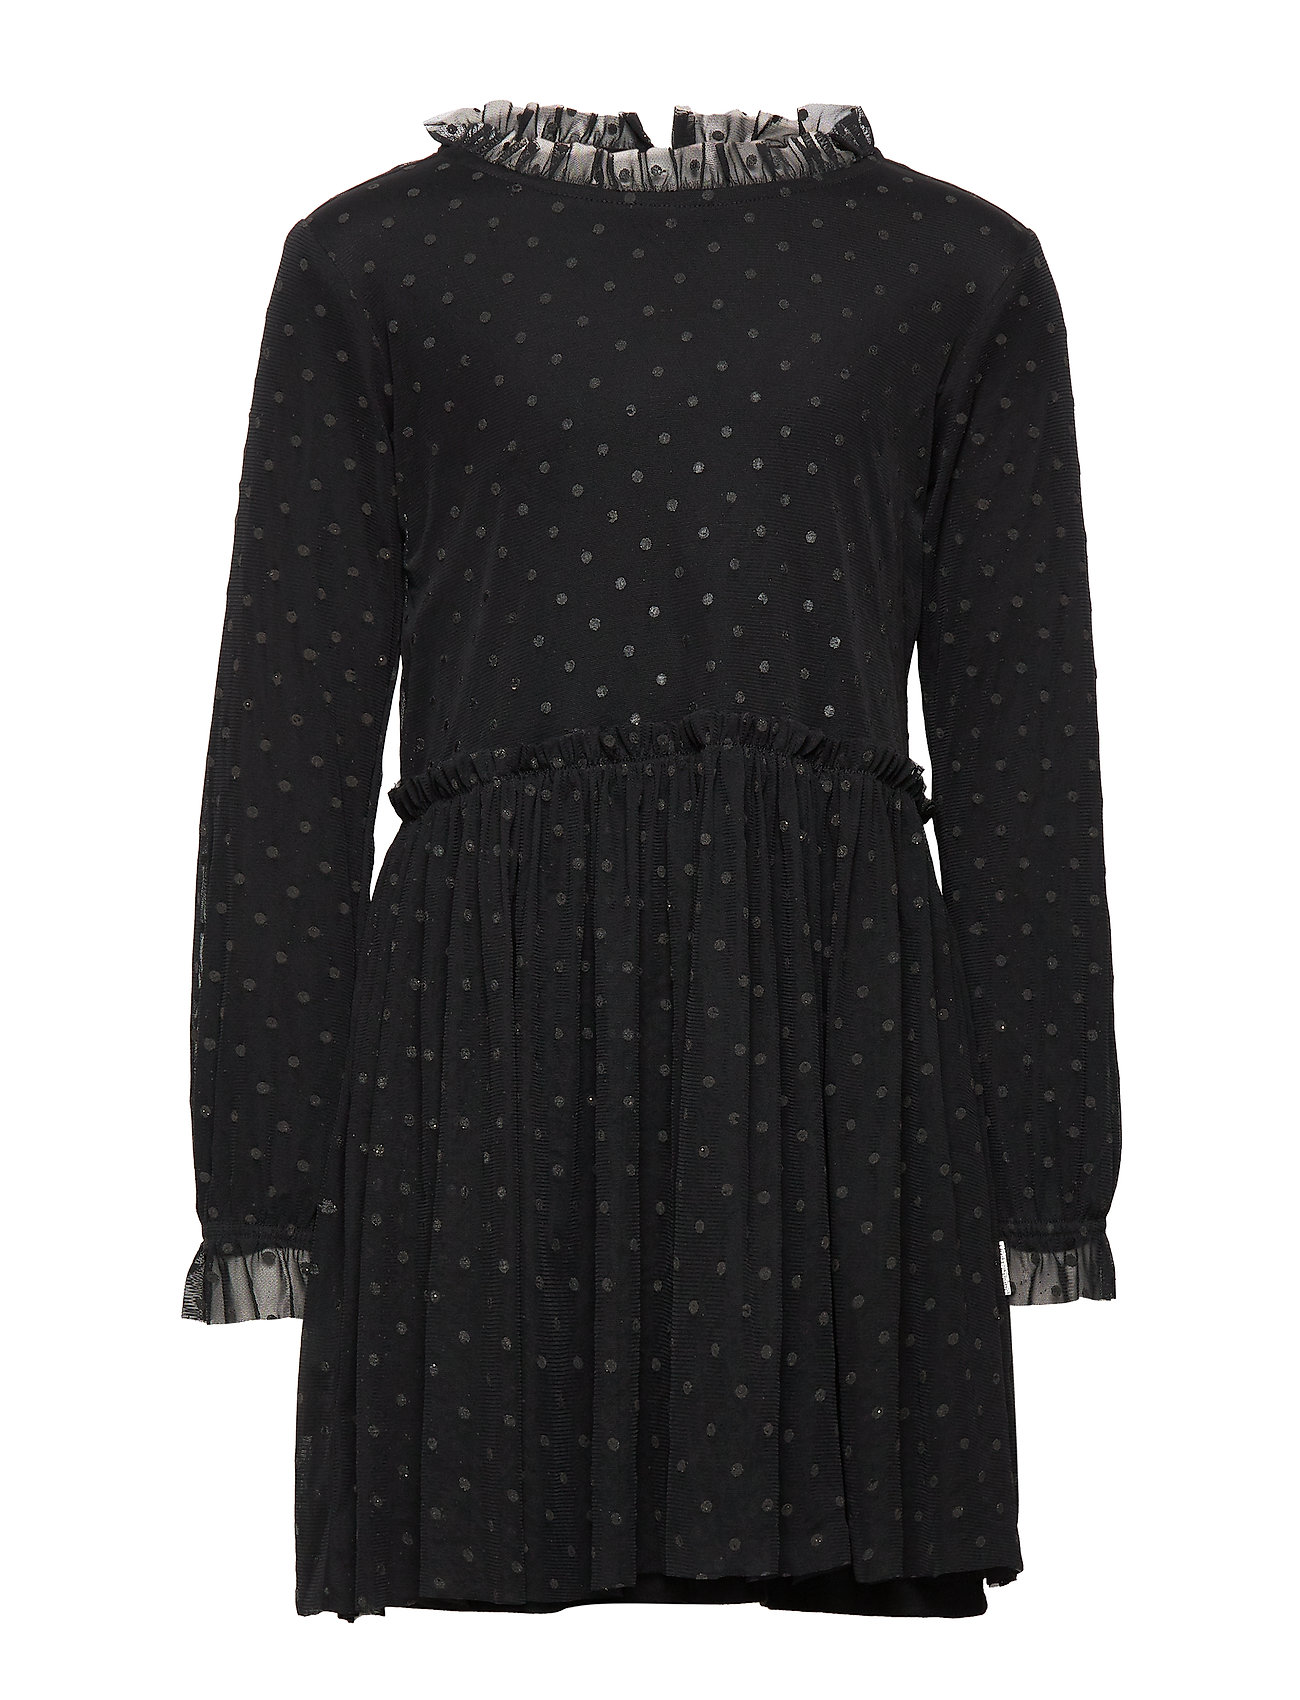 Hust & Claire Kate - Dress - BLACK